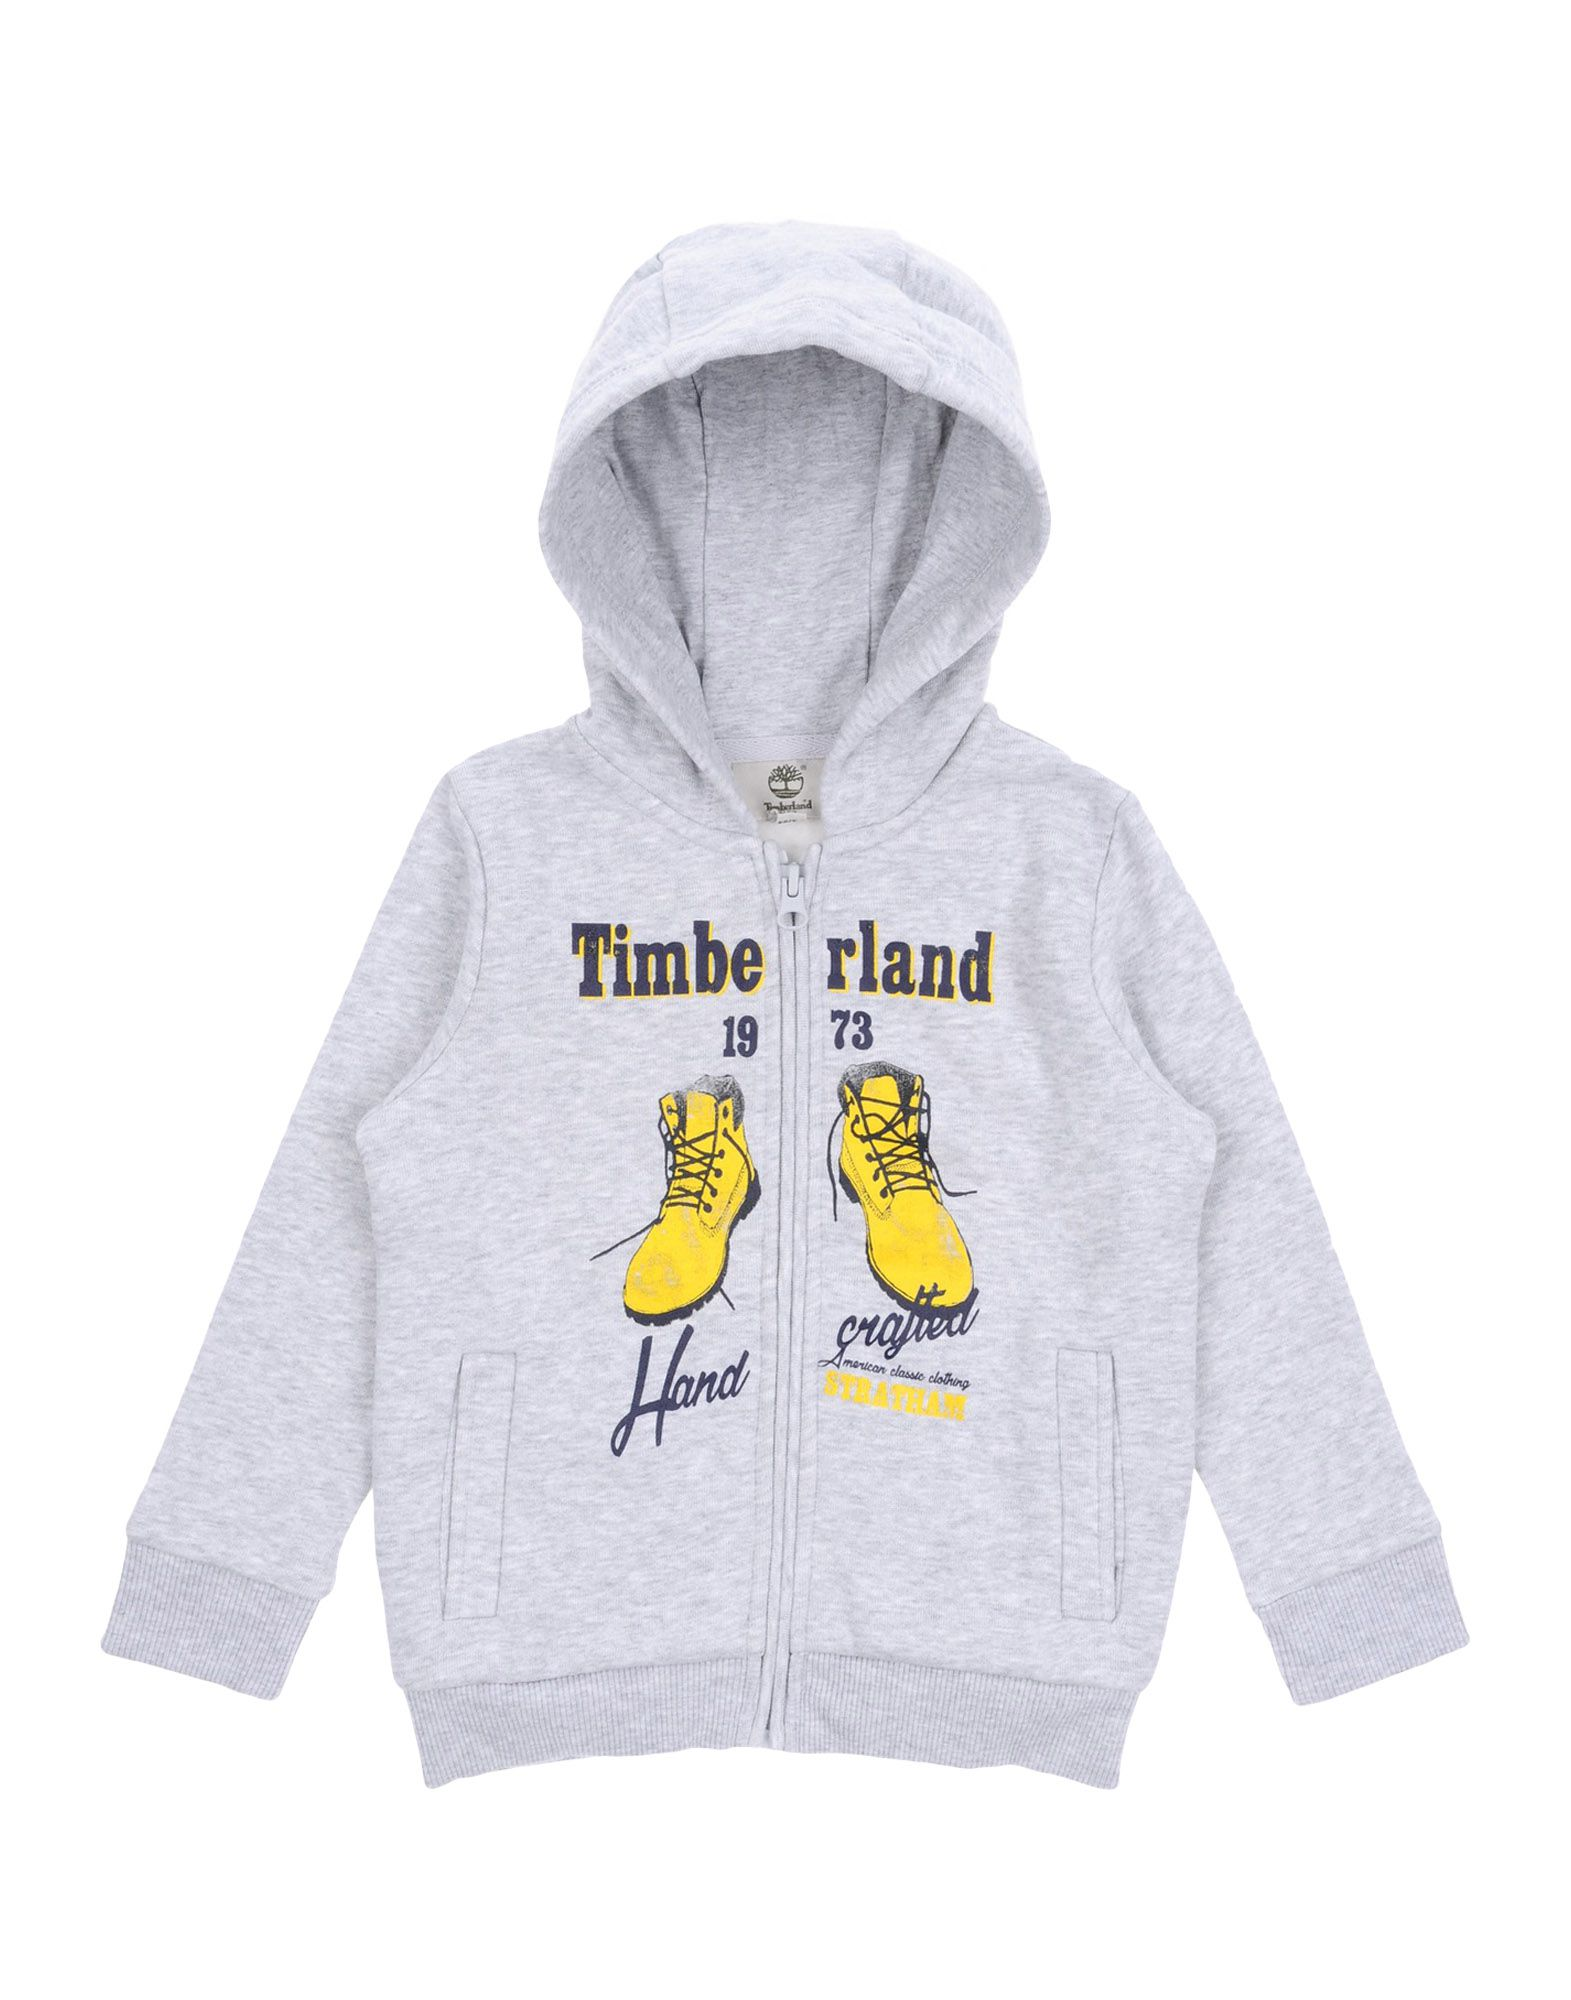 Timberland - Topwear - Sweatshirts - On Yoox.com